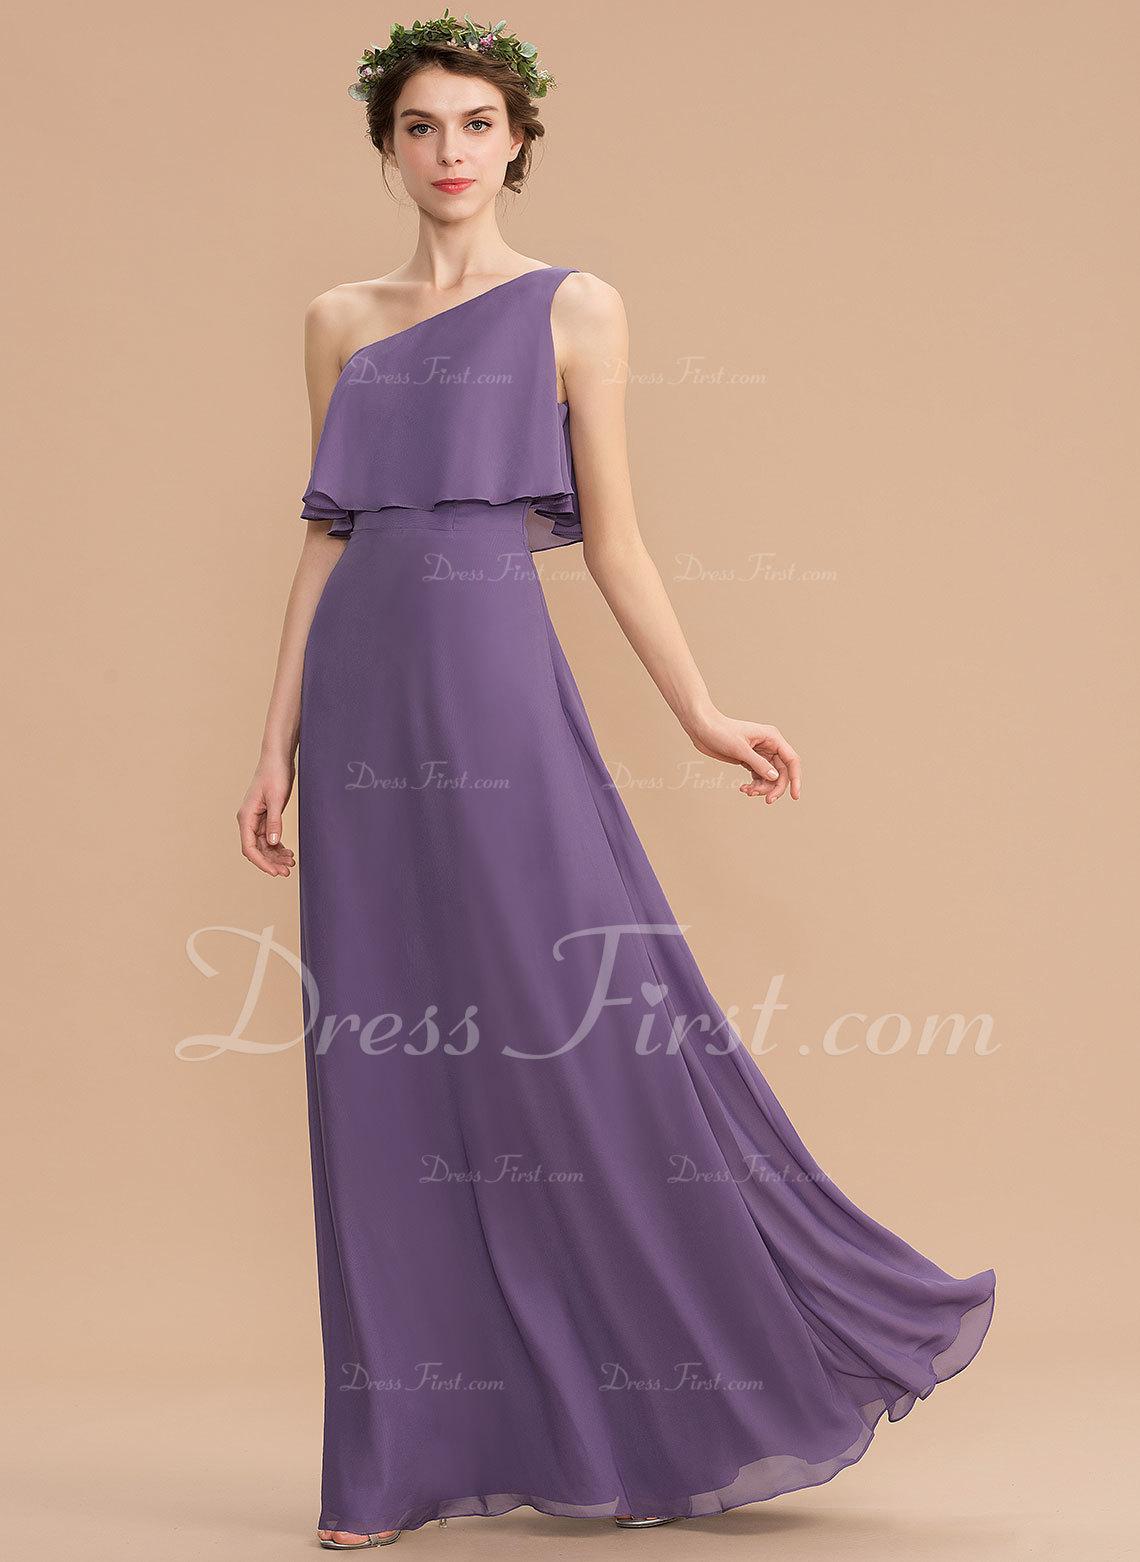 fdeb3645432 A-Line One-Shoulder Floor-Length Chiffon Bridesmaid Dress (007165844 ...